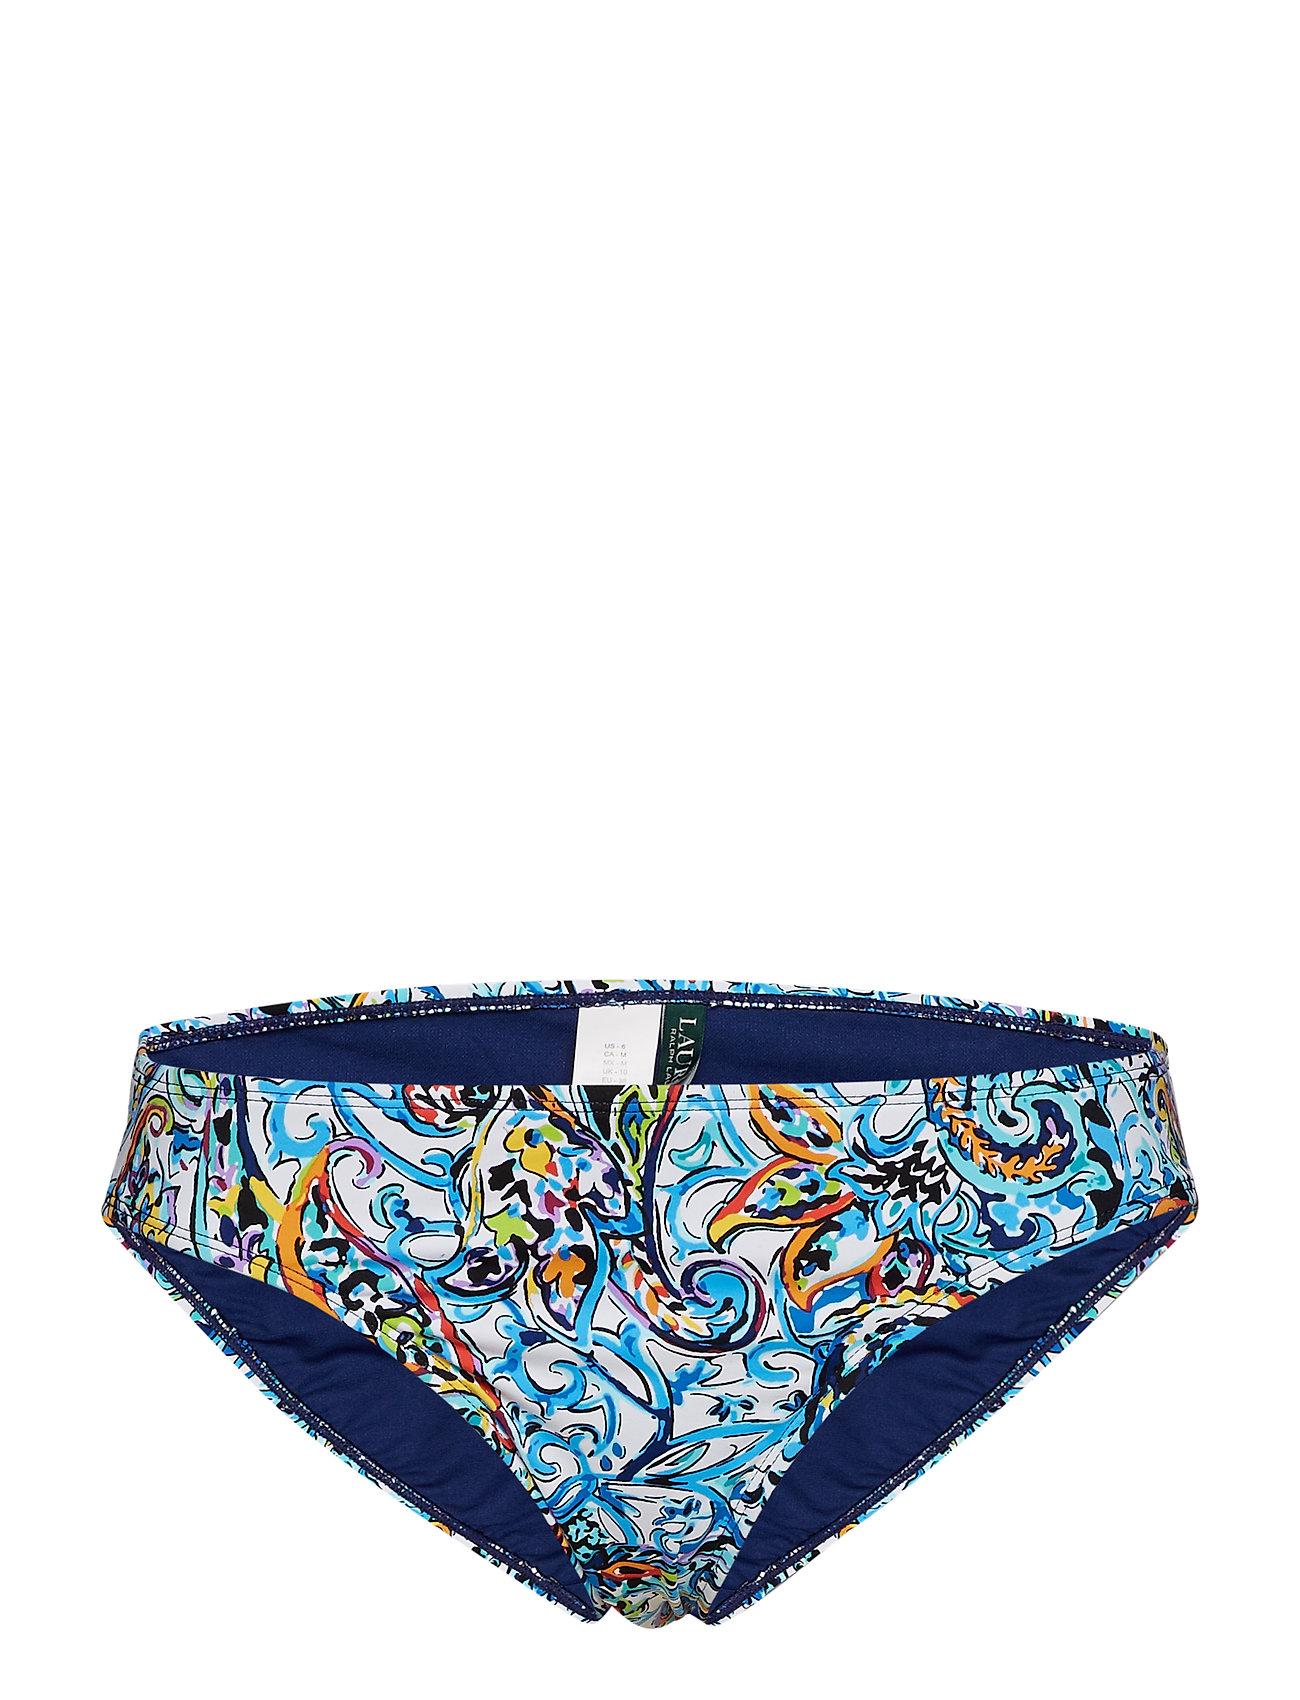 Lauren Ralph Lauren Swimwear Mystic Paisley Print Hipster - BLUE